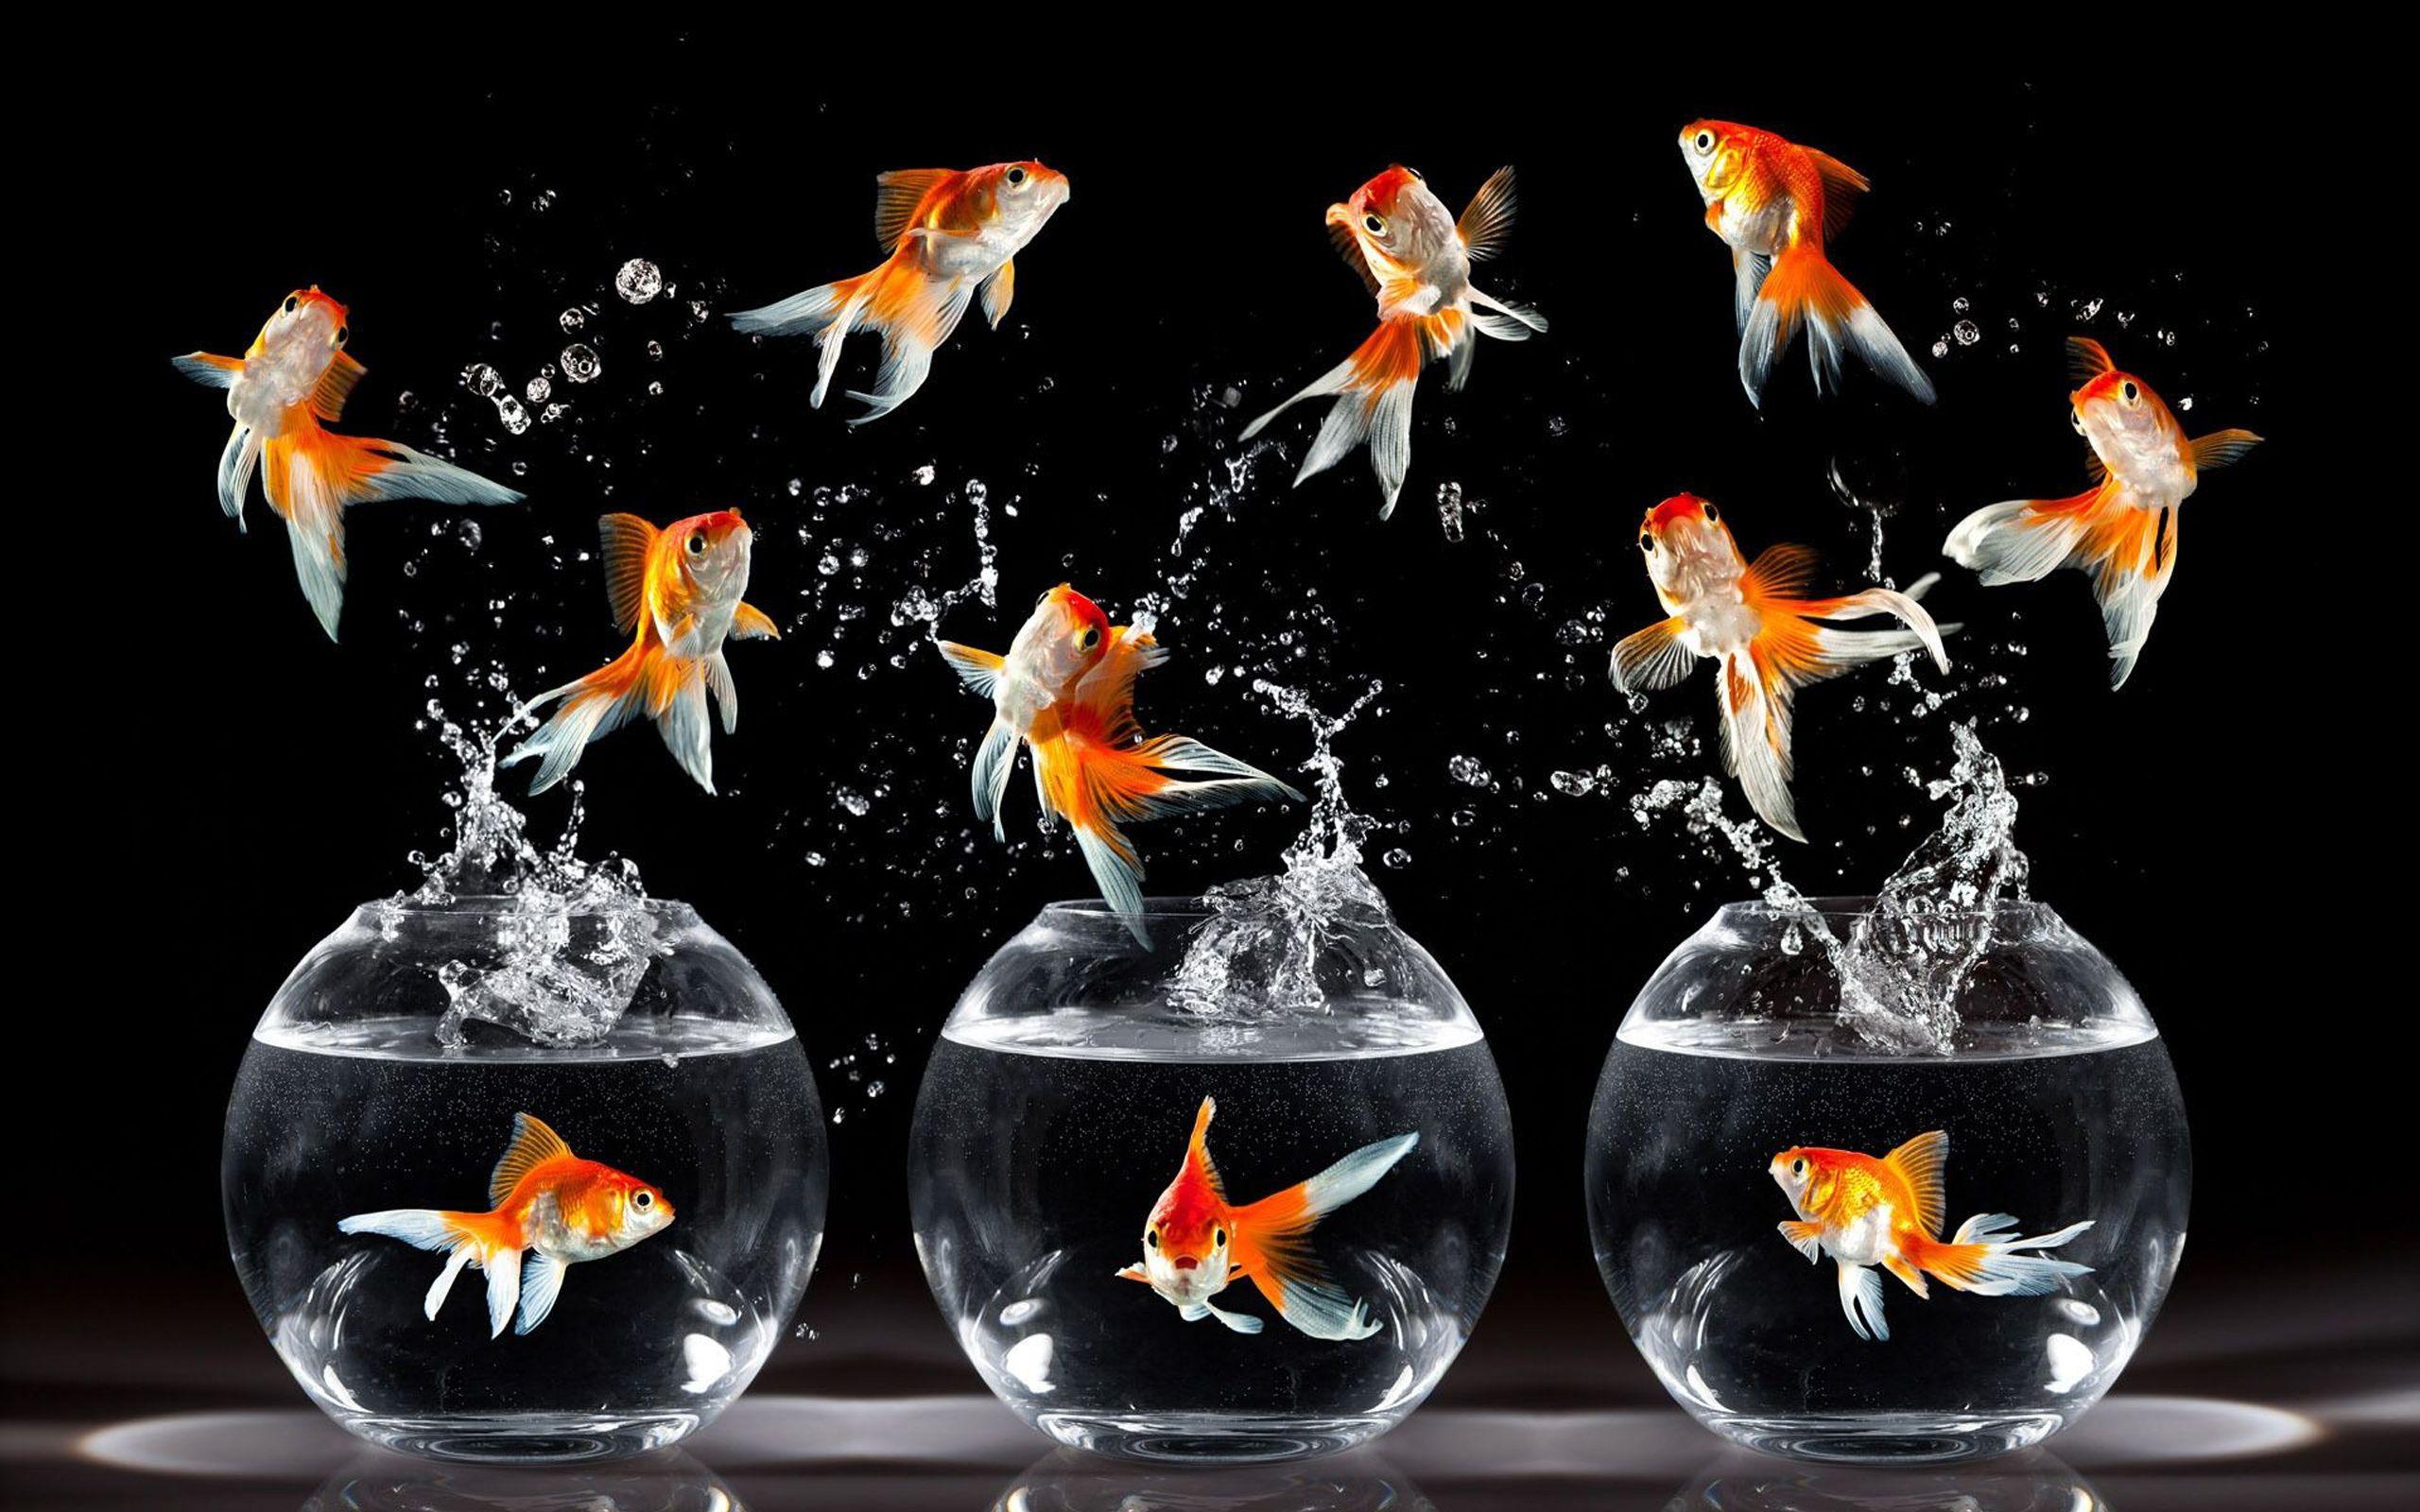 Fish in aquarium desktop wallpaper - Jewelry Desktop Backgrounds Hd Star Fish Desktop Aquarium Happy And Water Hd 2560x1600 Hd Wallpaper